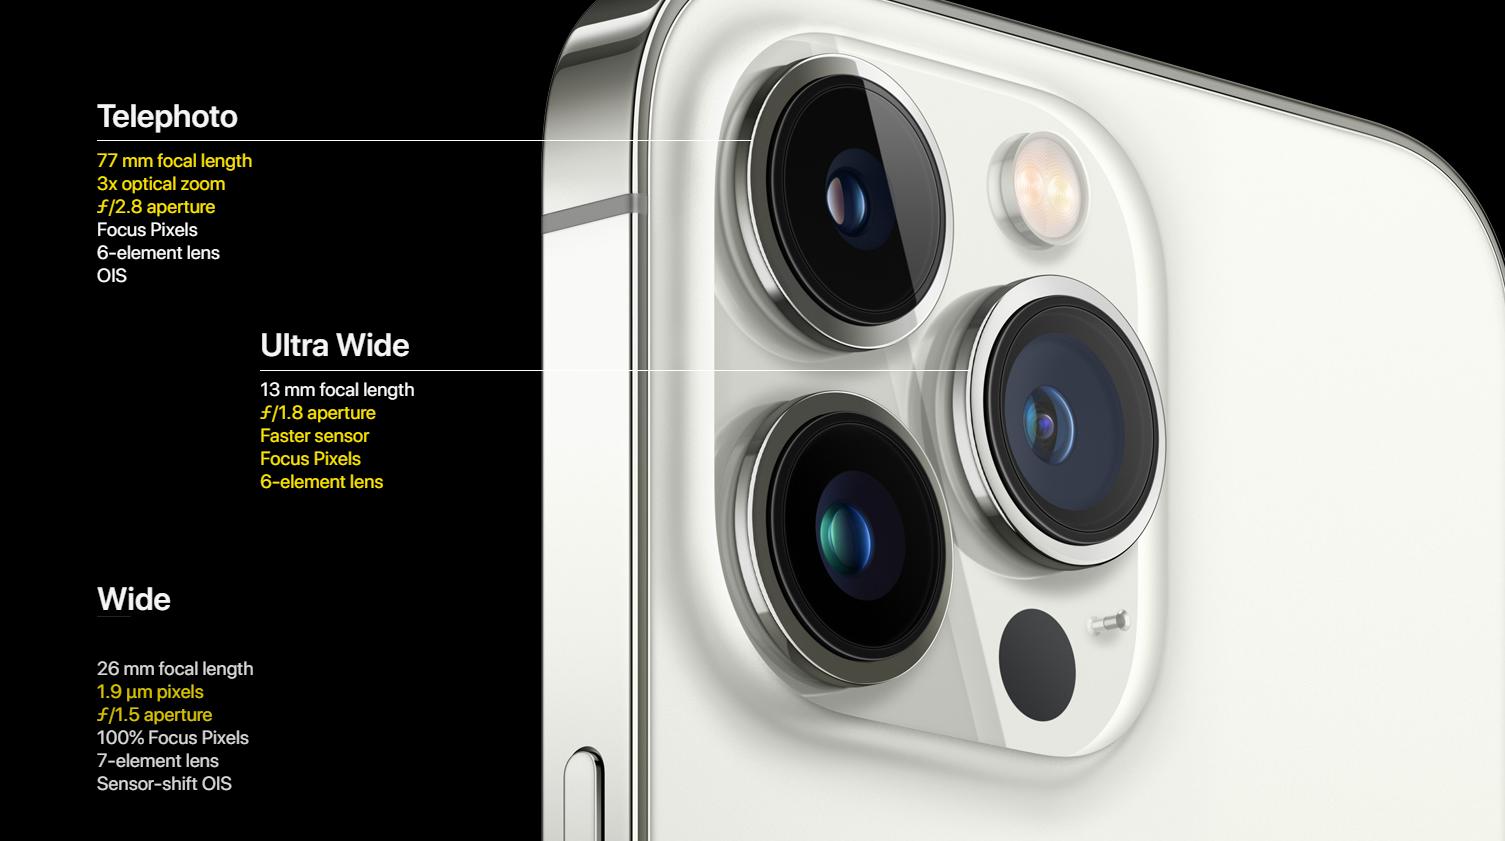 Kamery u iPhone 13 Pro